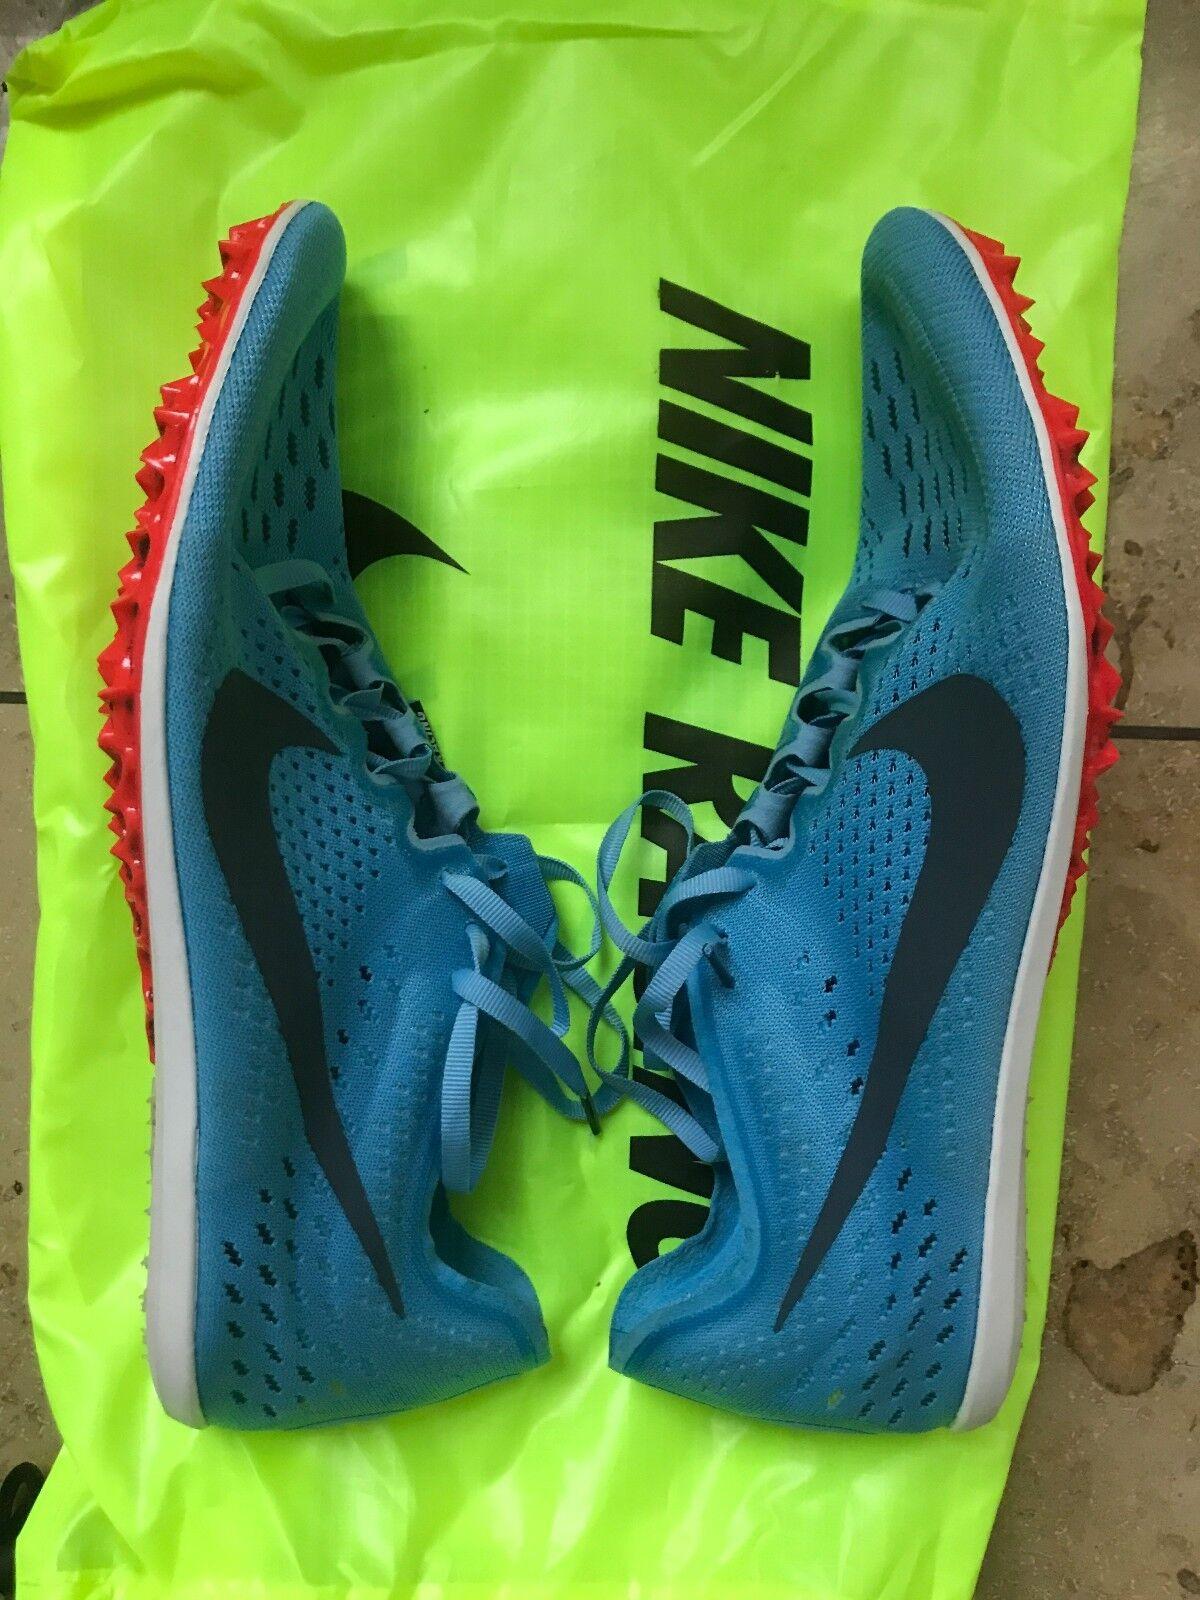 Nike Men's Size 11 Nike Victory 3 spike